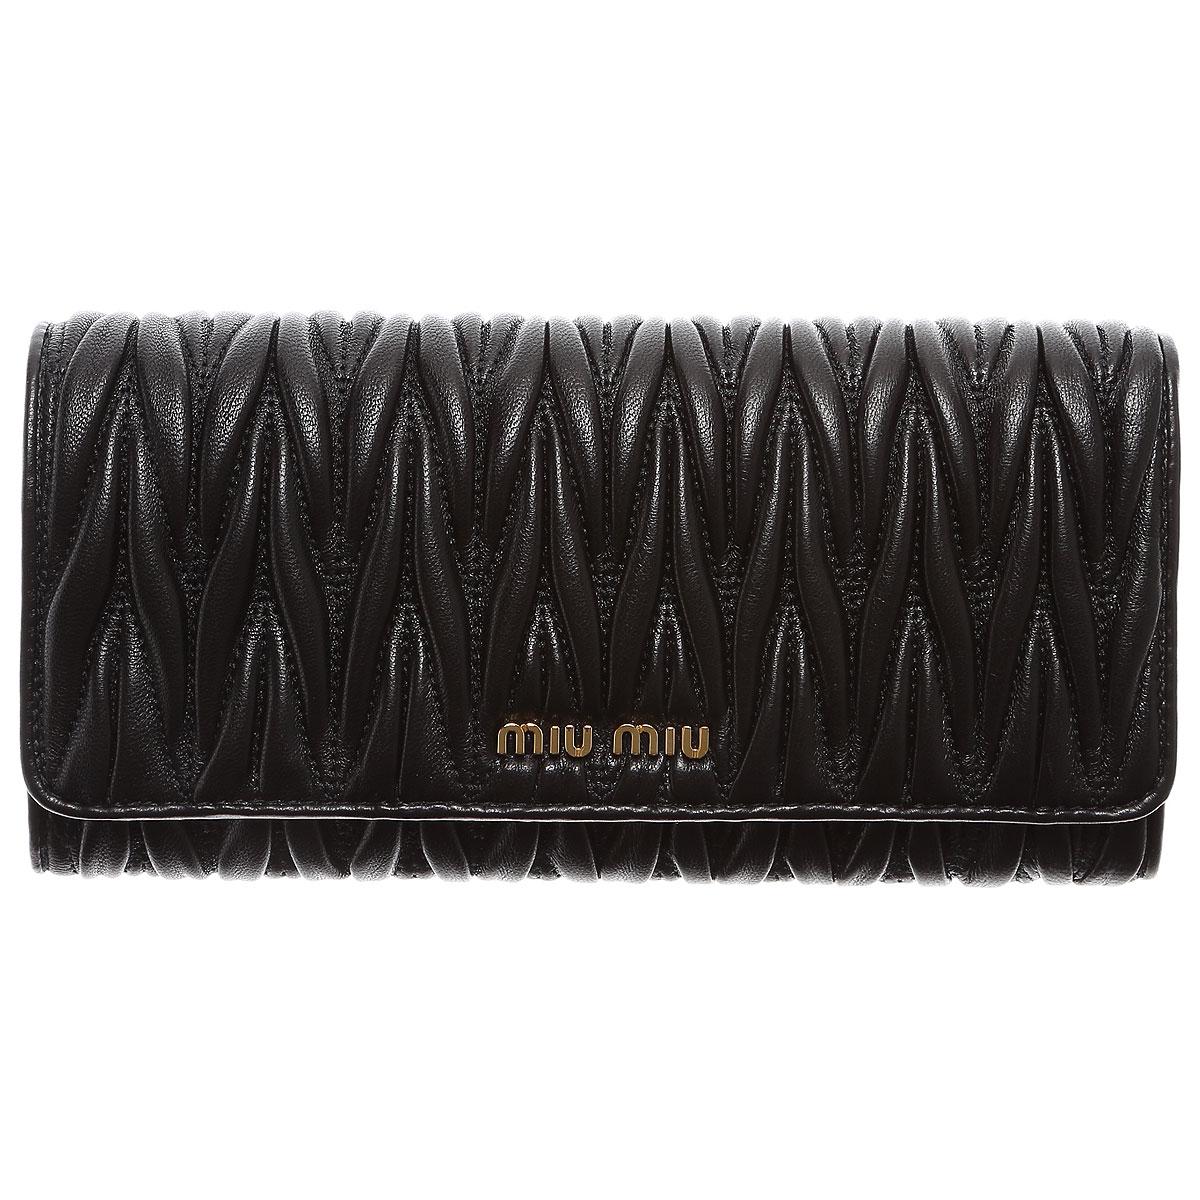 Miu Miu Wallet for Women On Sale, Black, Leather, 2019